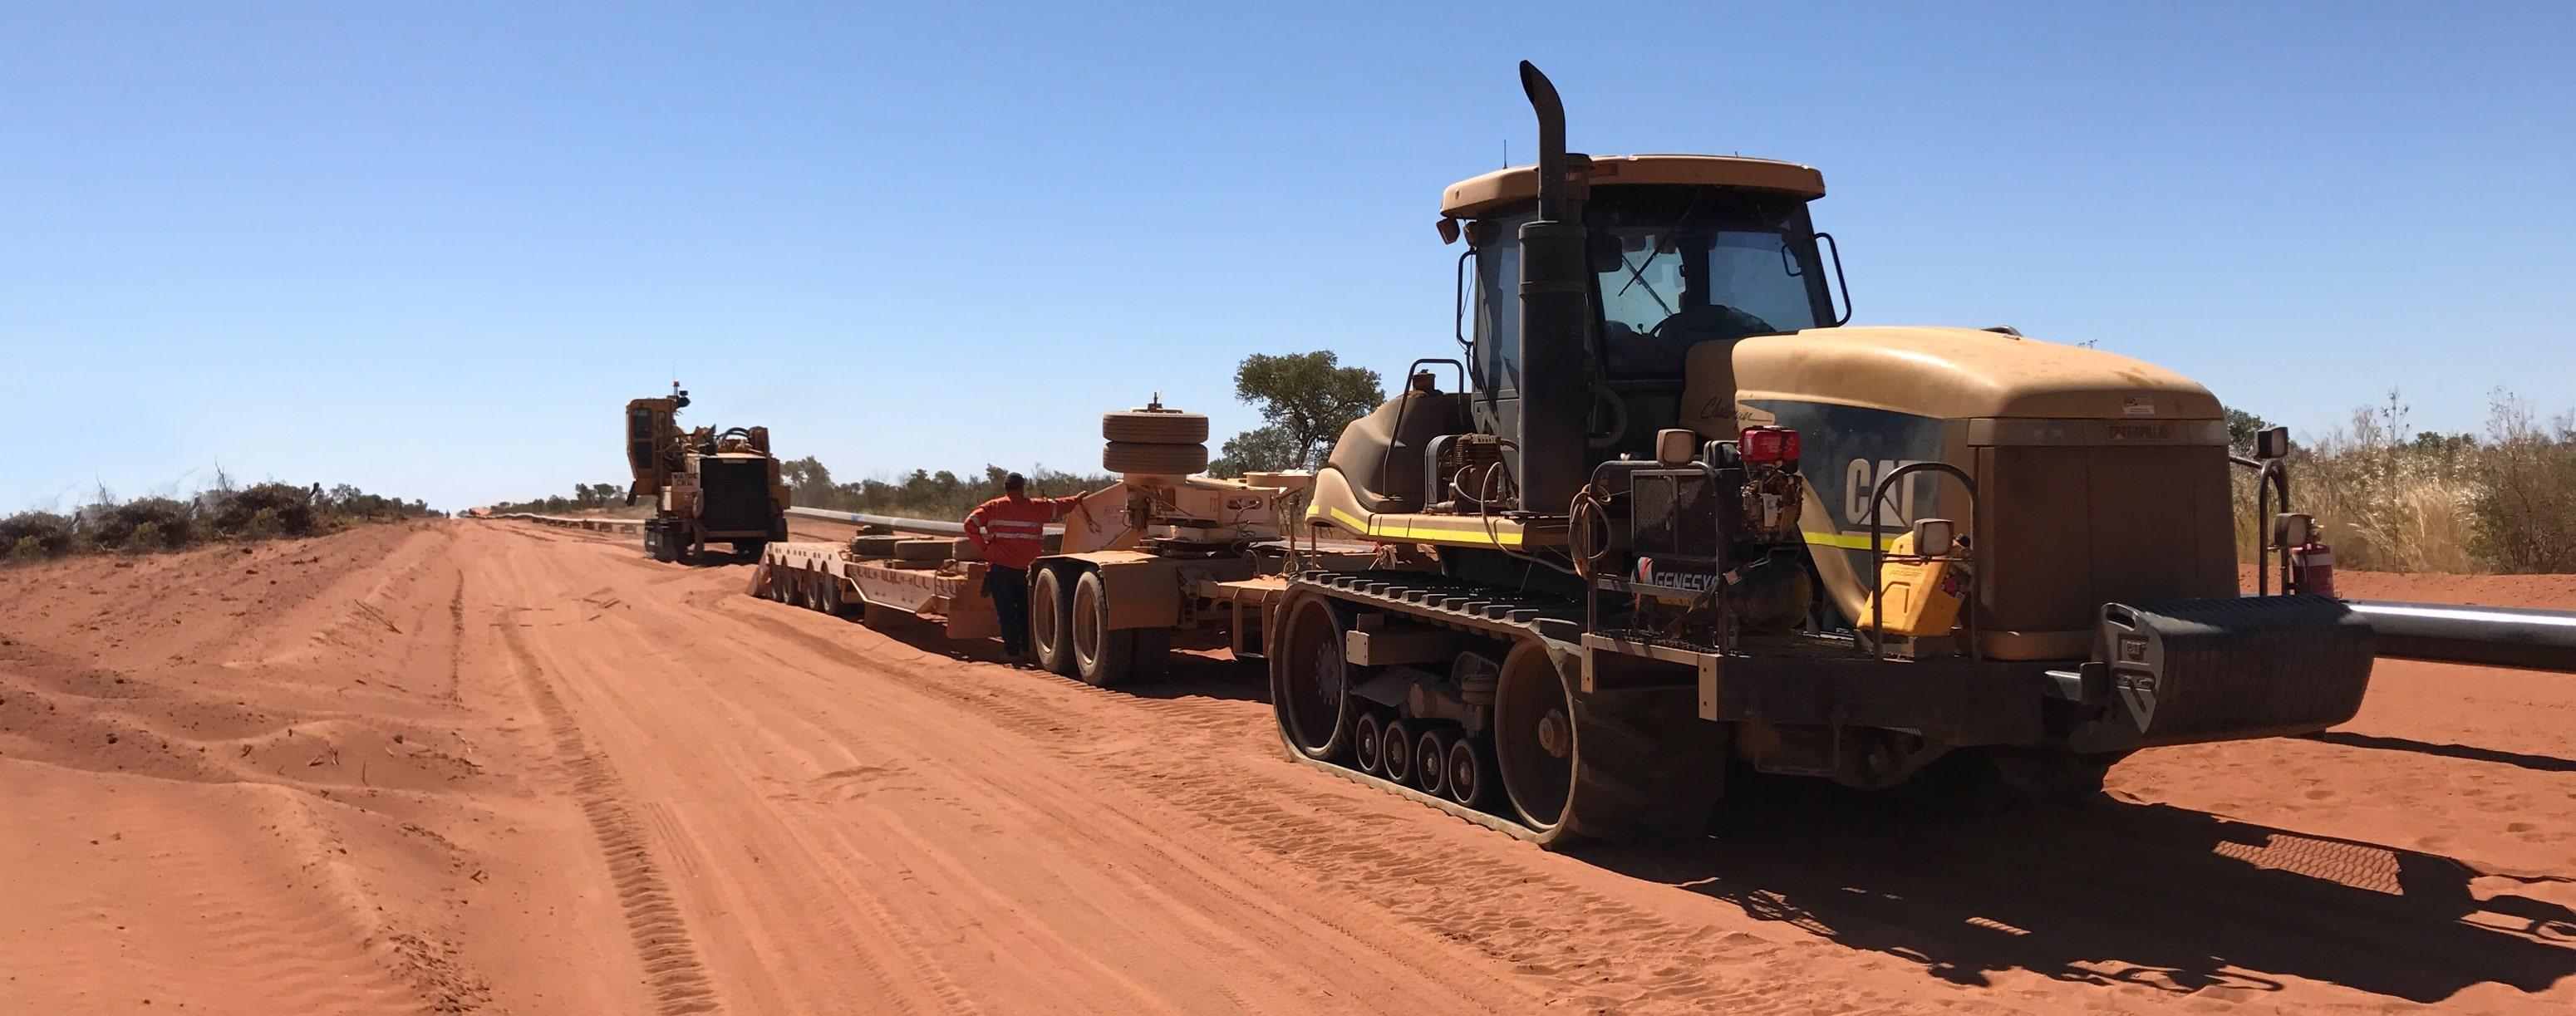 International pipeline services_IPS_pipeline construction equipment